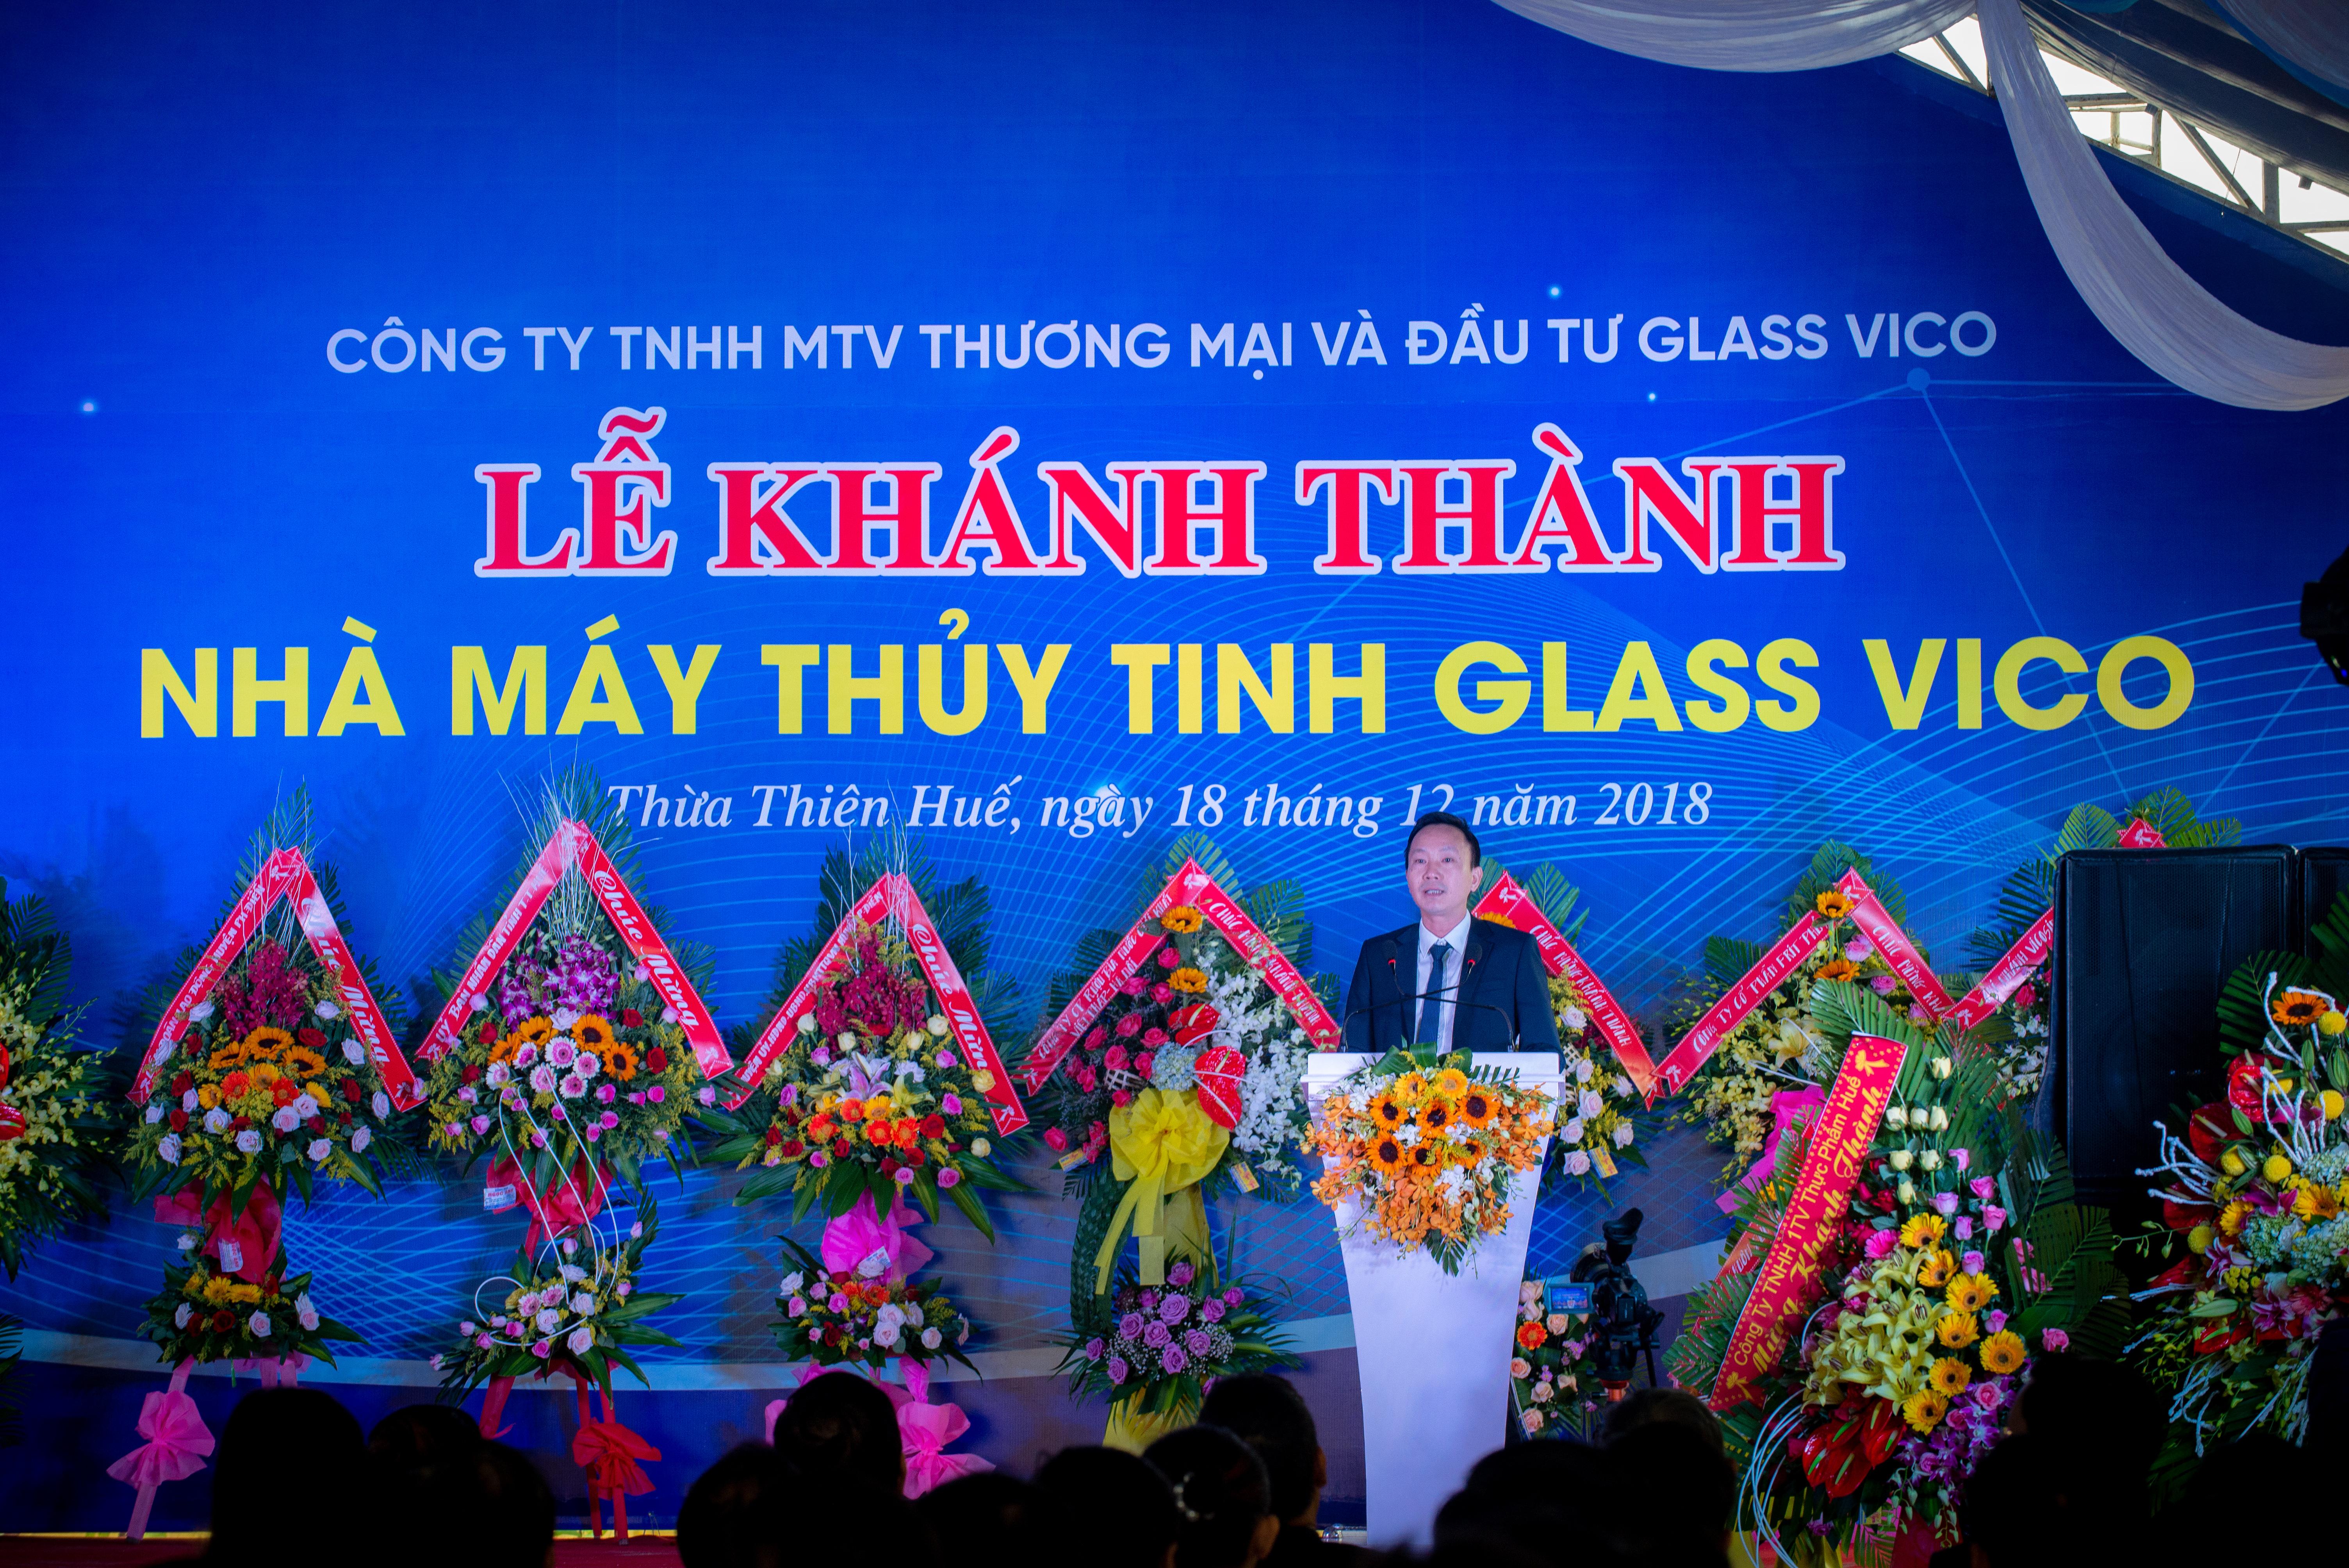 Inauguration of GlassVico